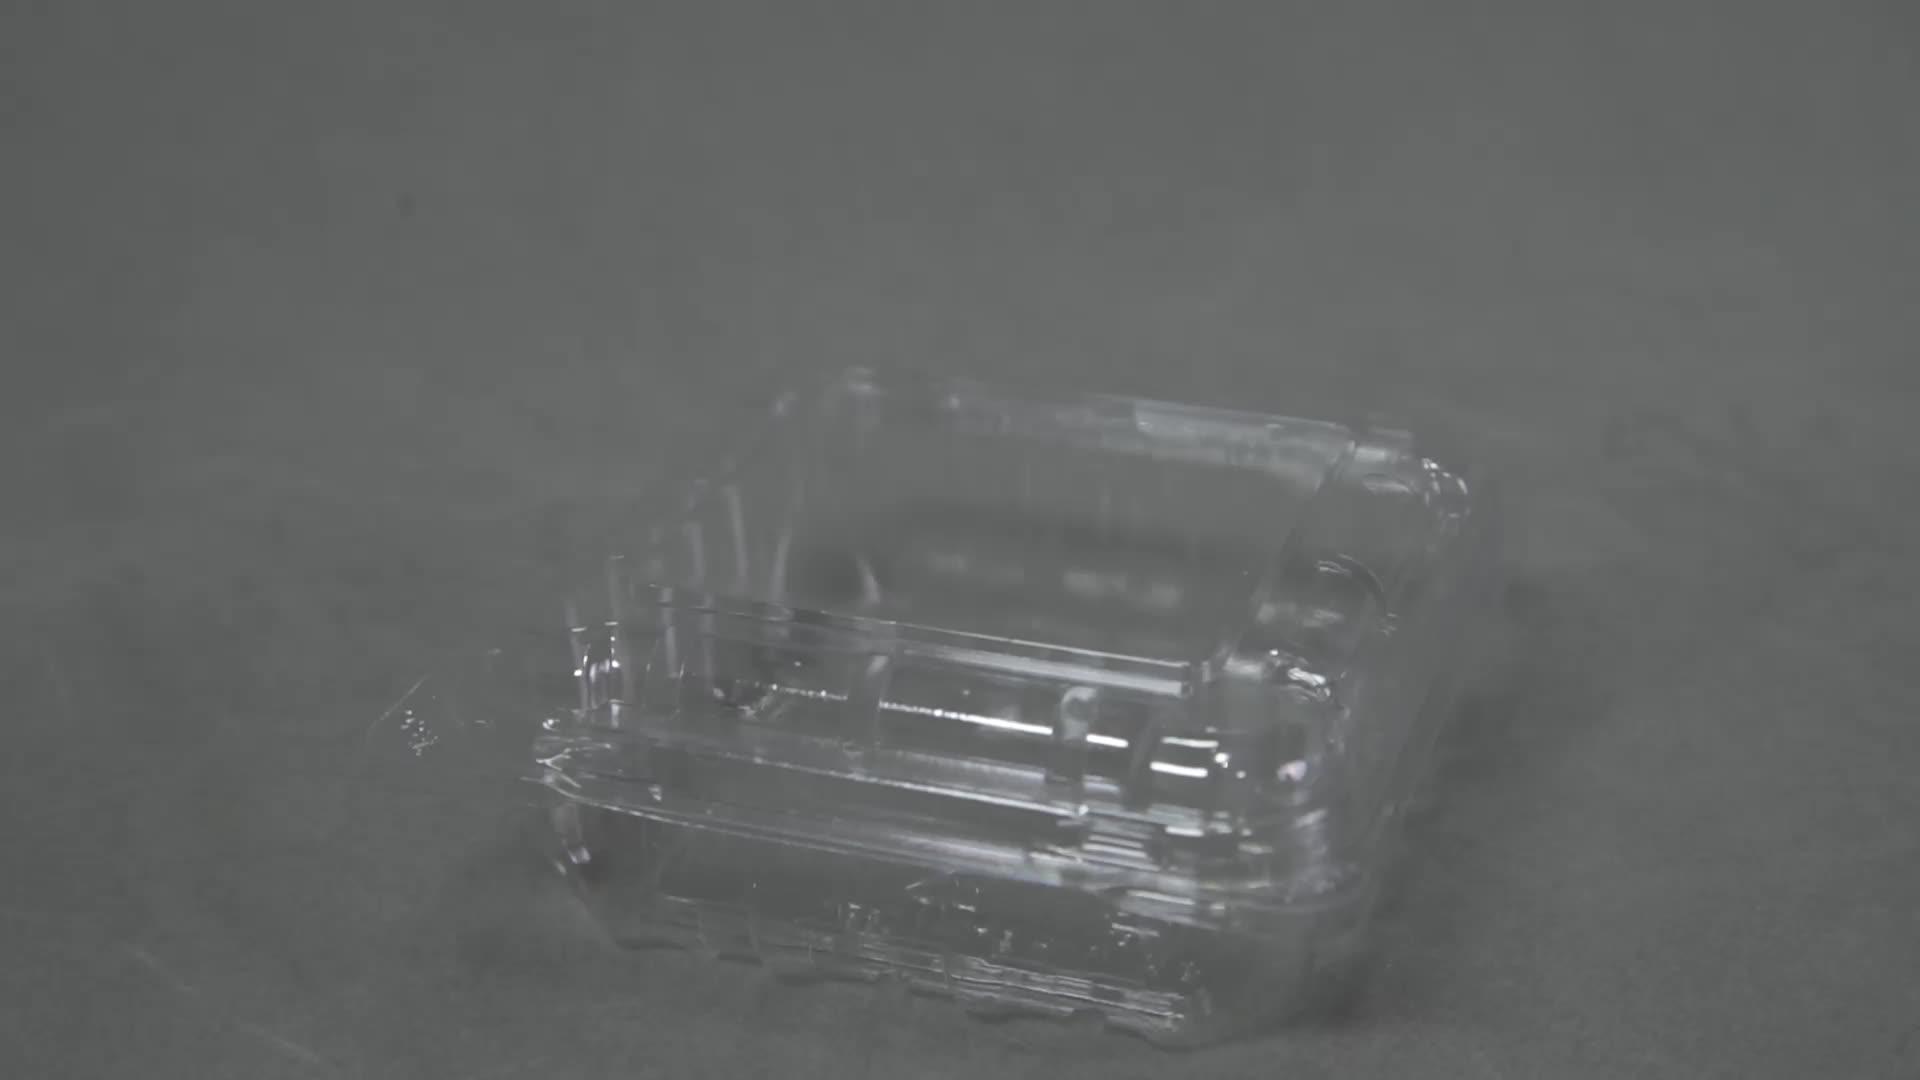 Descartável caixa de embalagem blister clamshell personalizado embalagem de comida de plástico pet clara recipiente de frutas de mirtilo 125g fresco